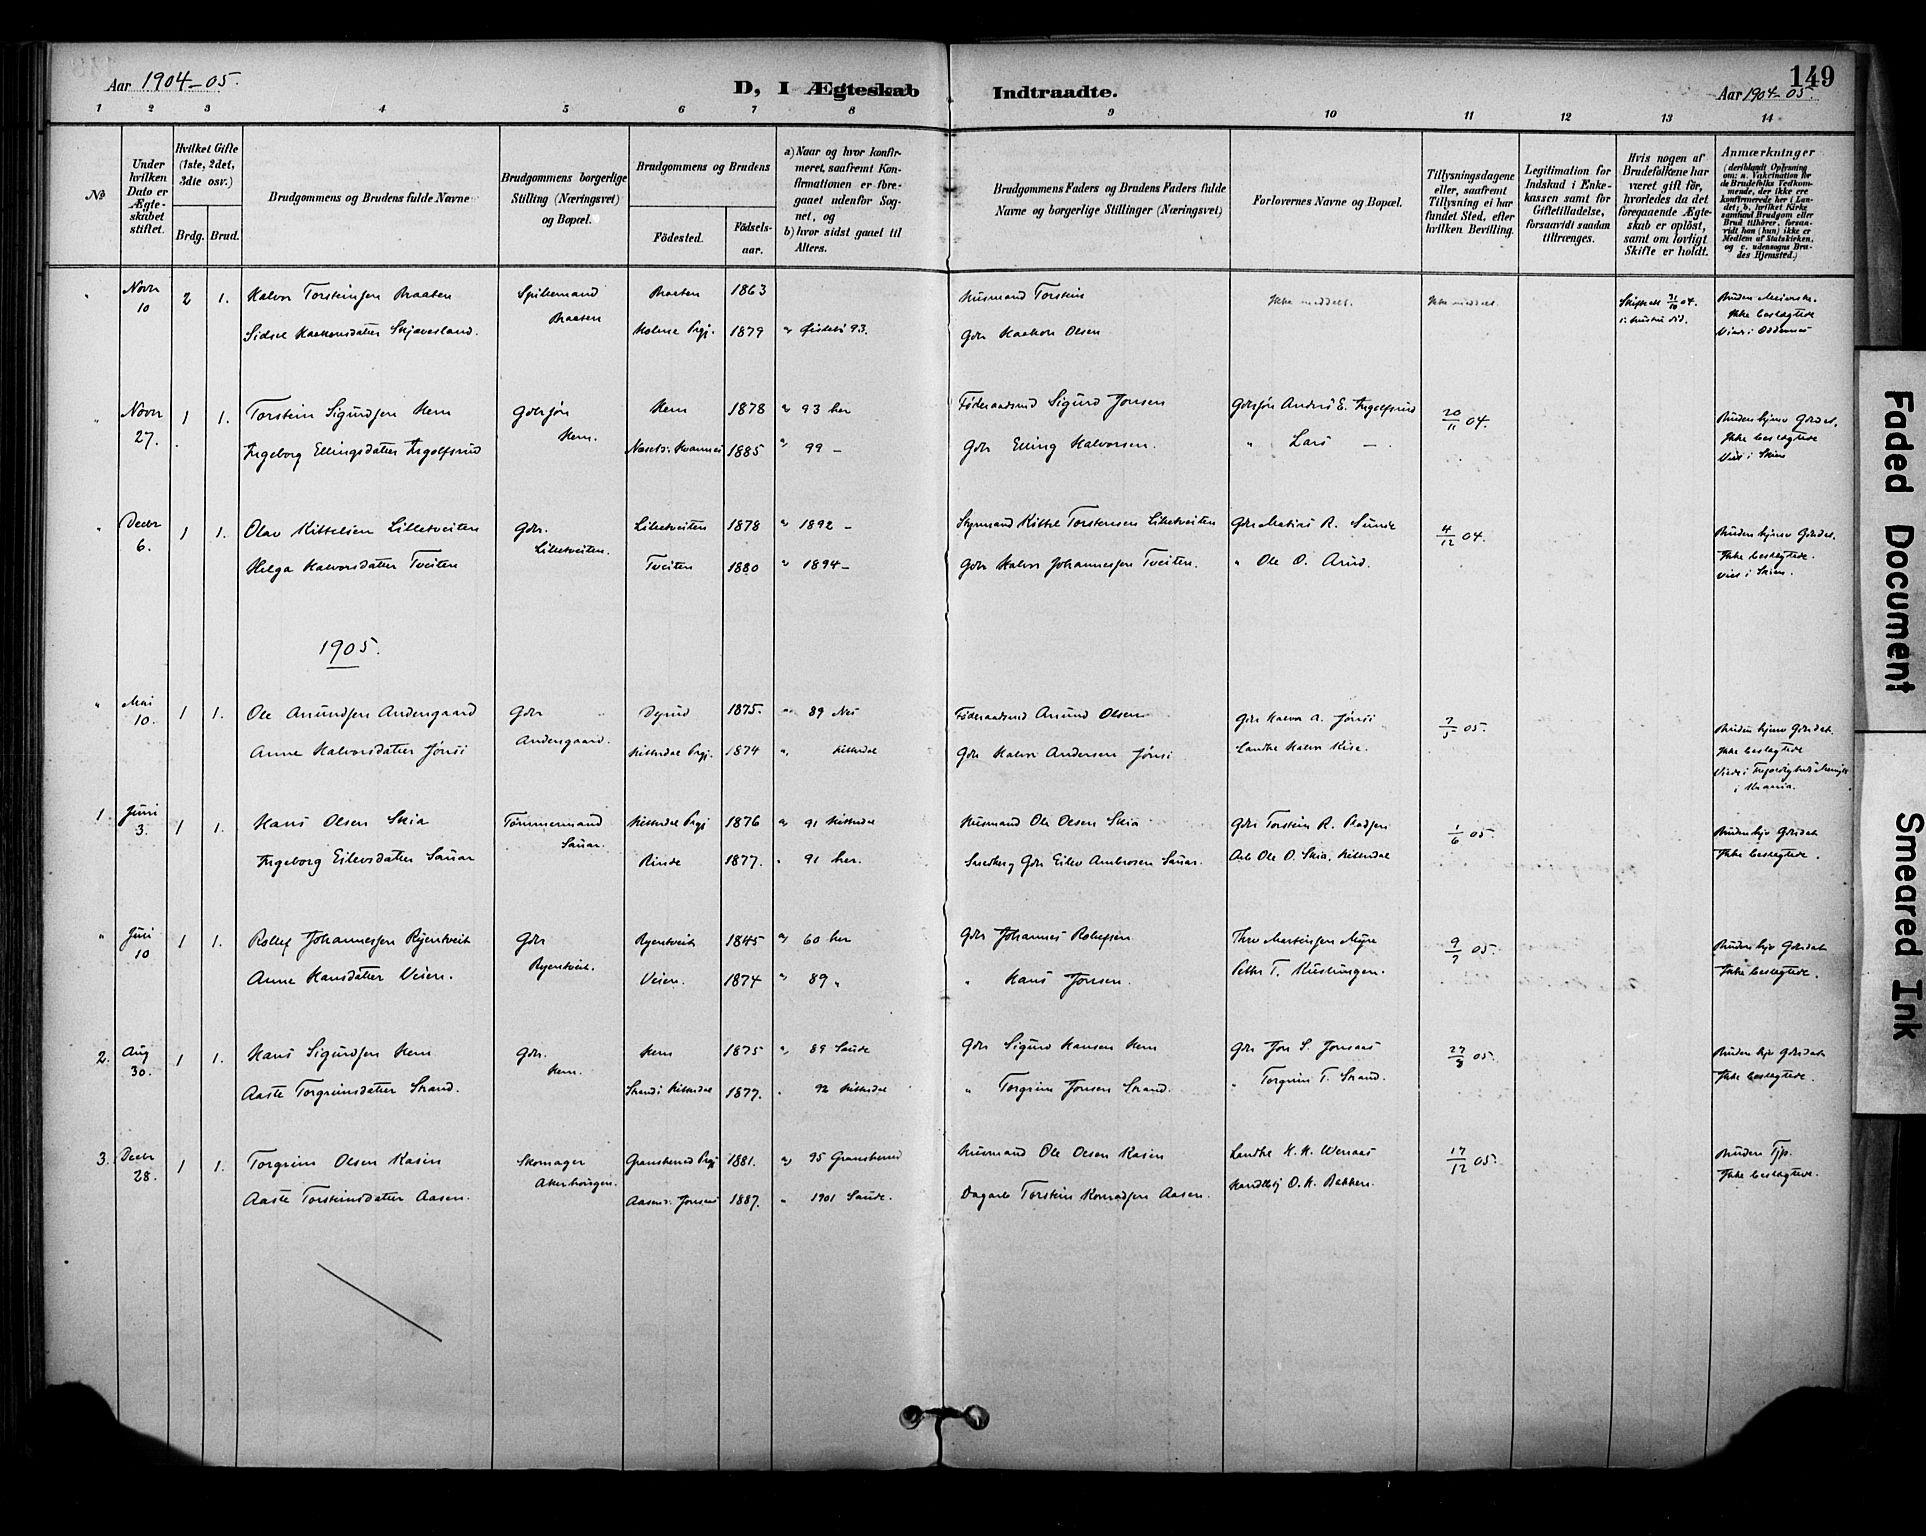 SAKO, Sauherad kirkebøker, F/Fa/L0009: Ministerialbok nr. I 9, 1887-1912, s. 149